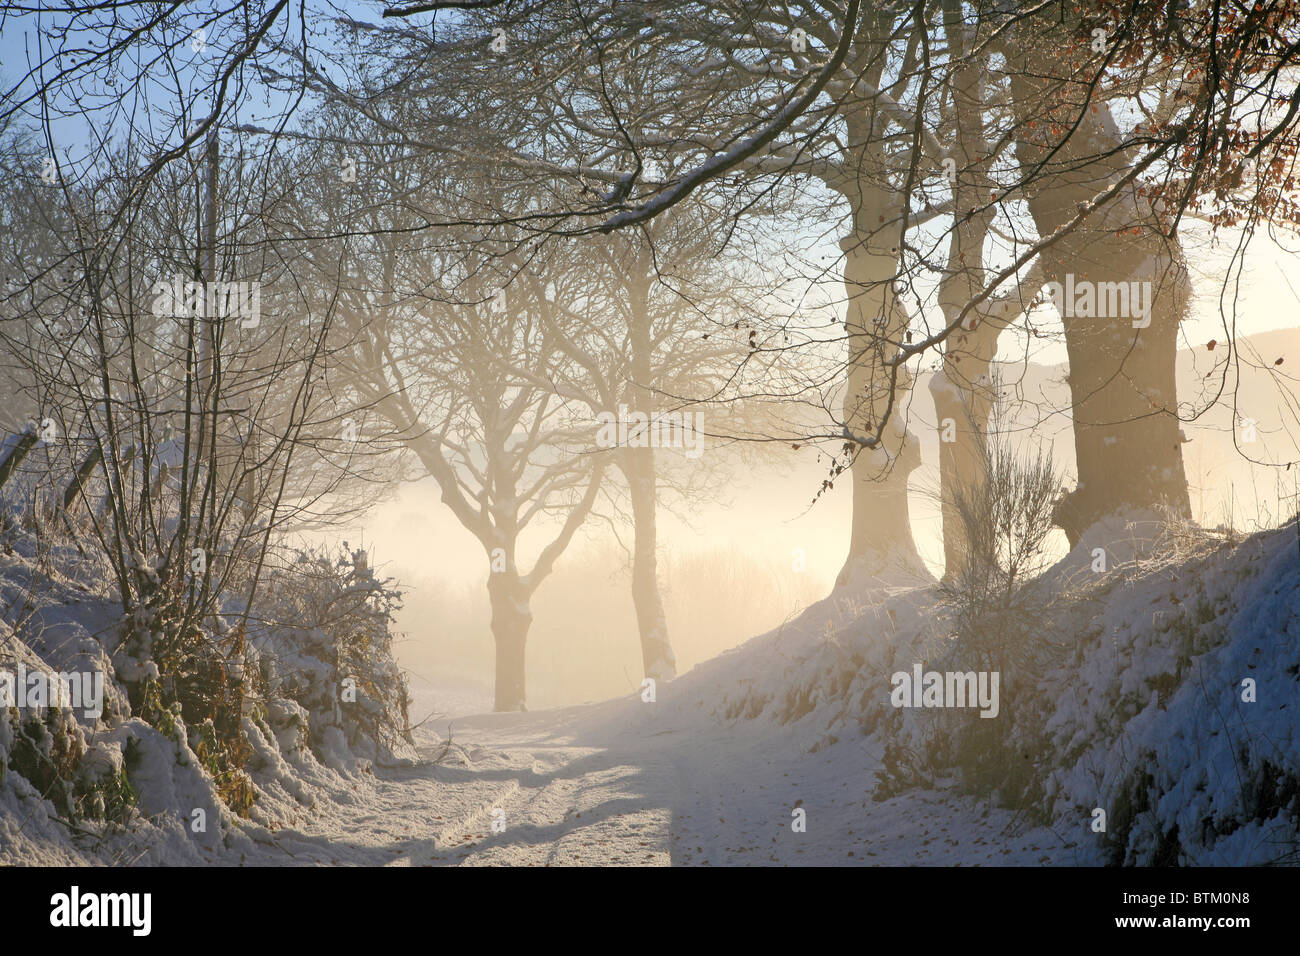 UK Scotland Tayside Misty Trees in winter Stock Photo